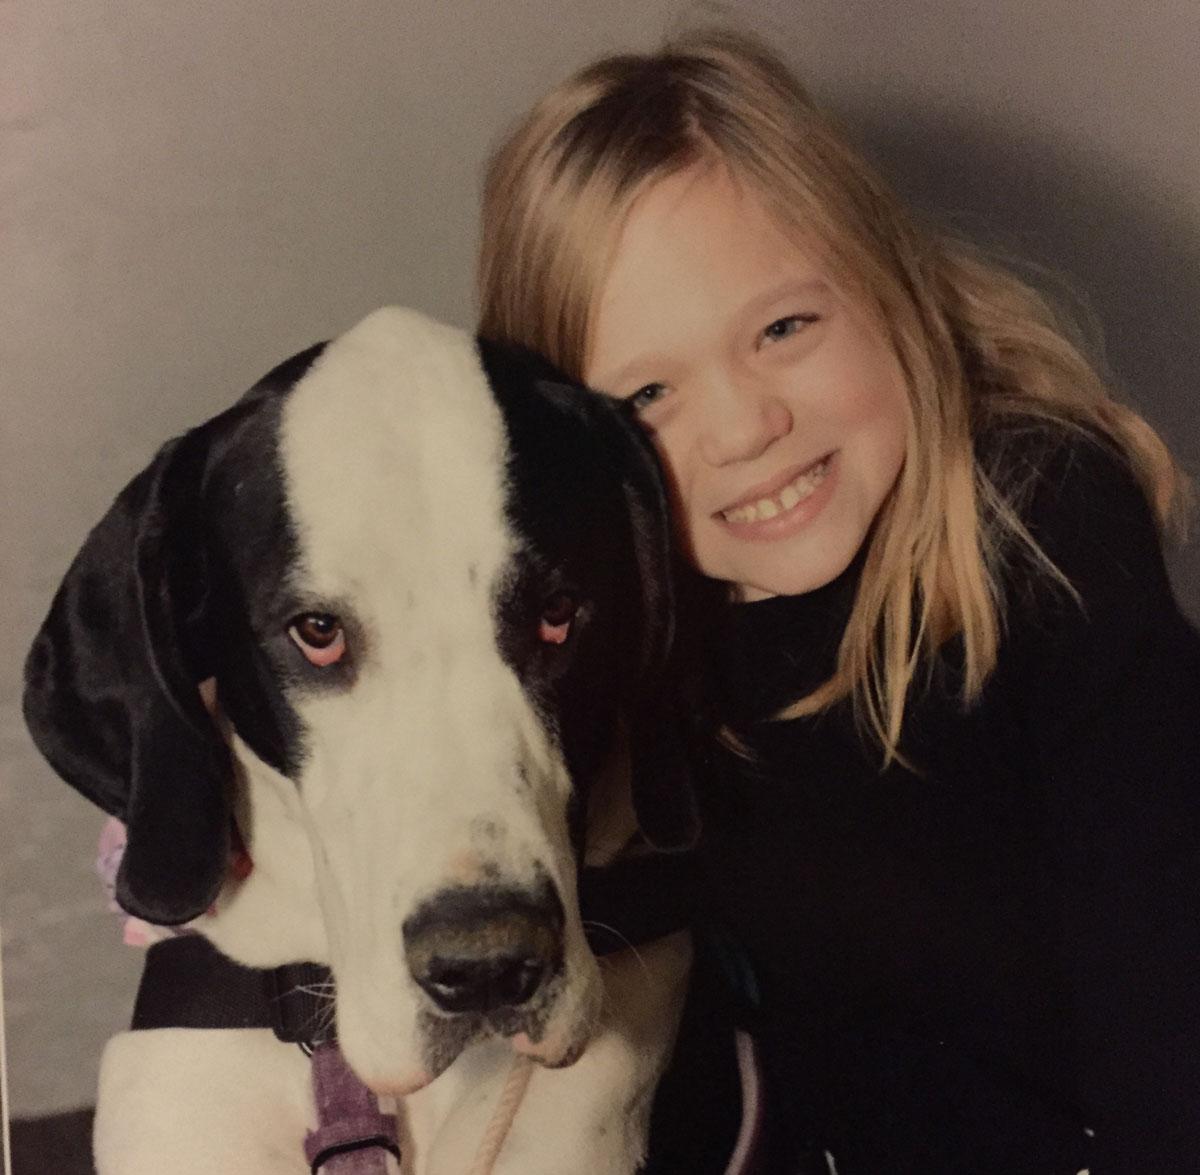 bella burton and her guide dog, George. photo provided to bostonmagazine.com.